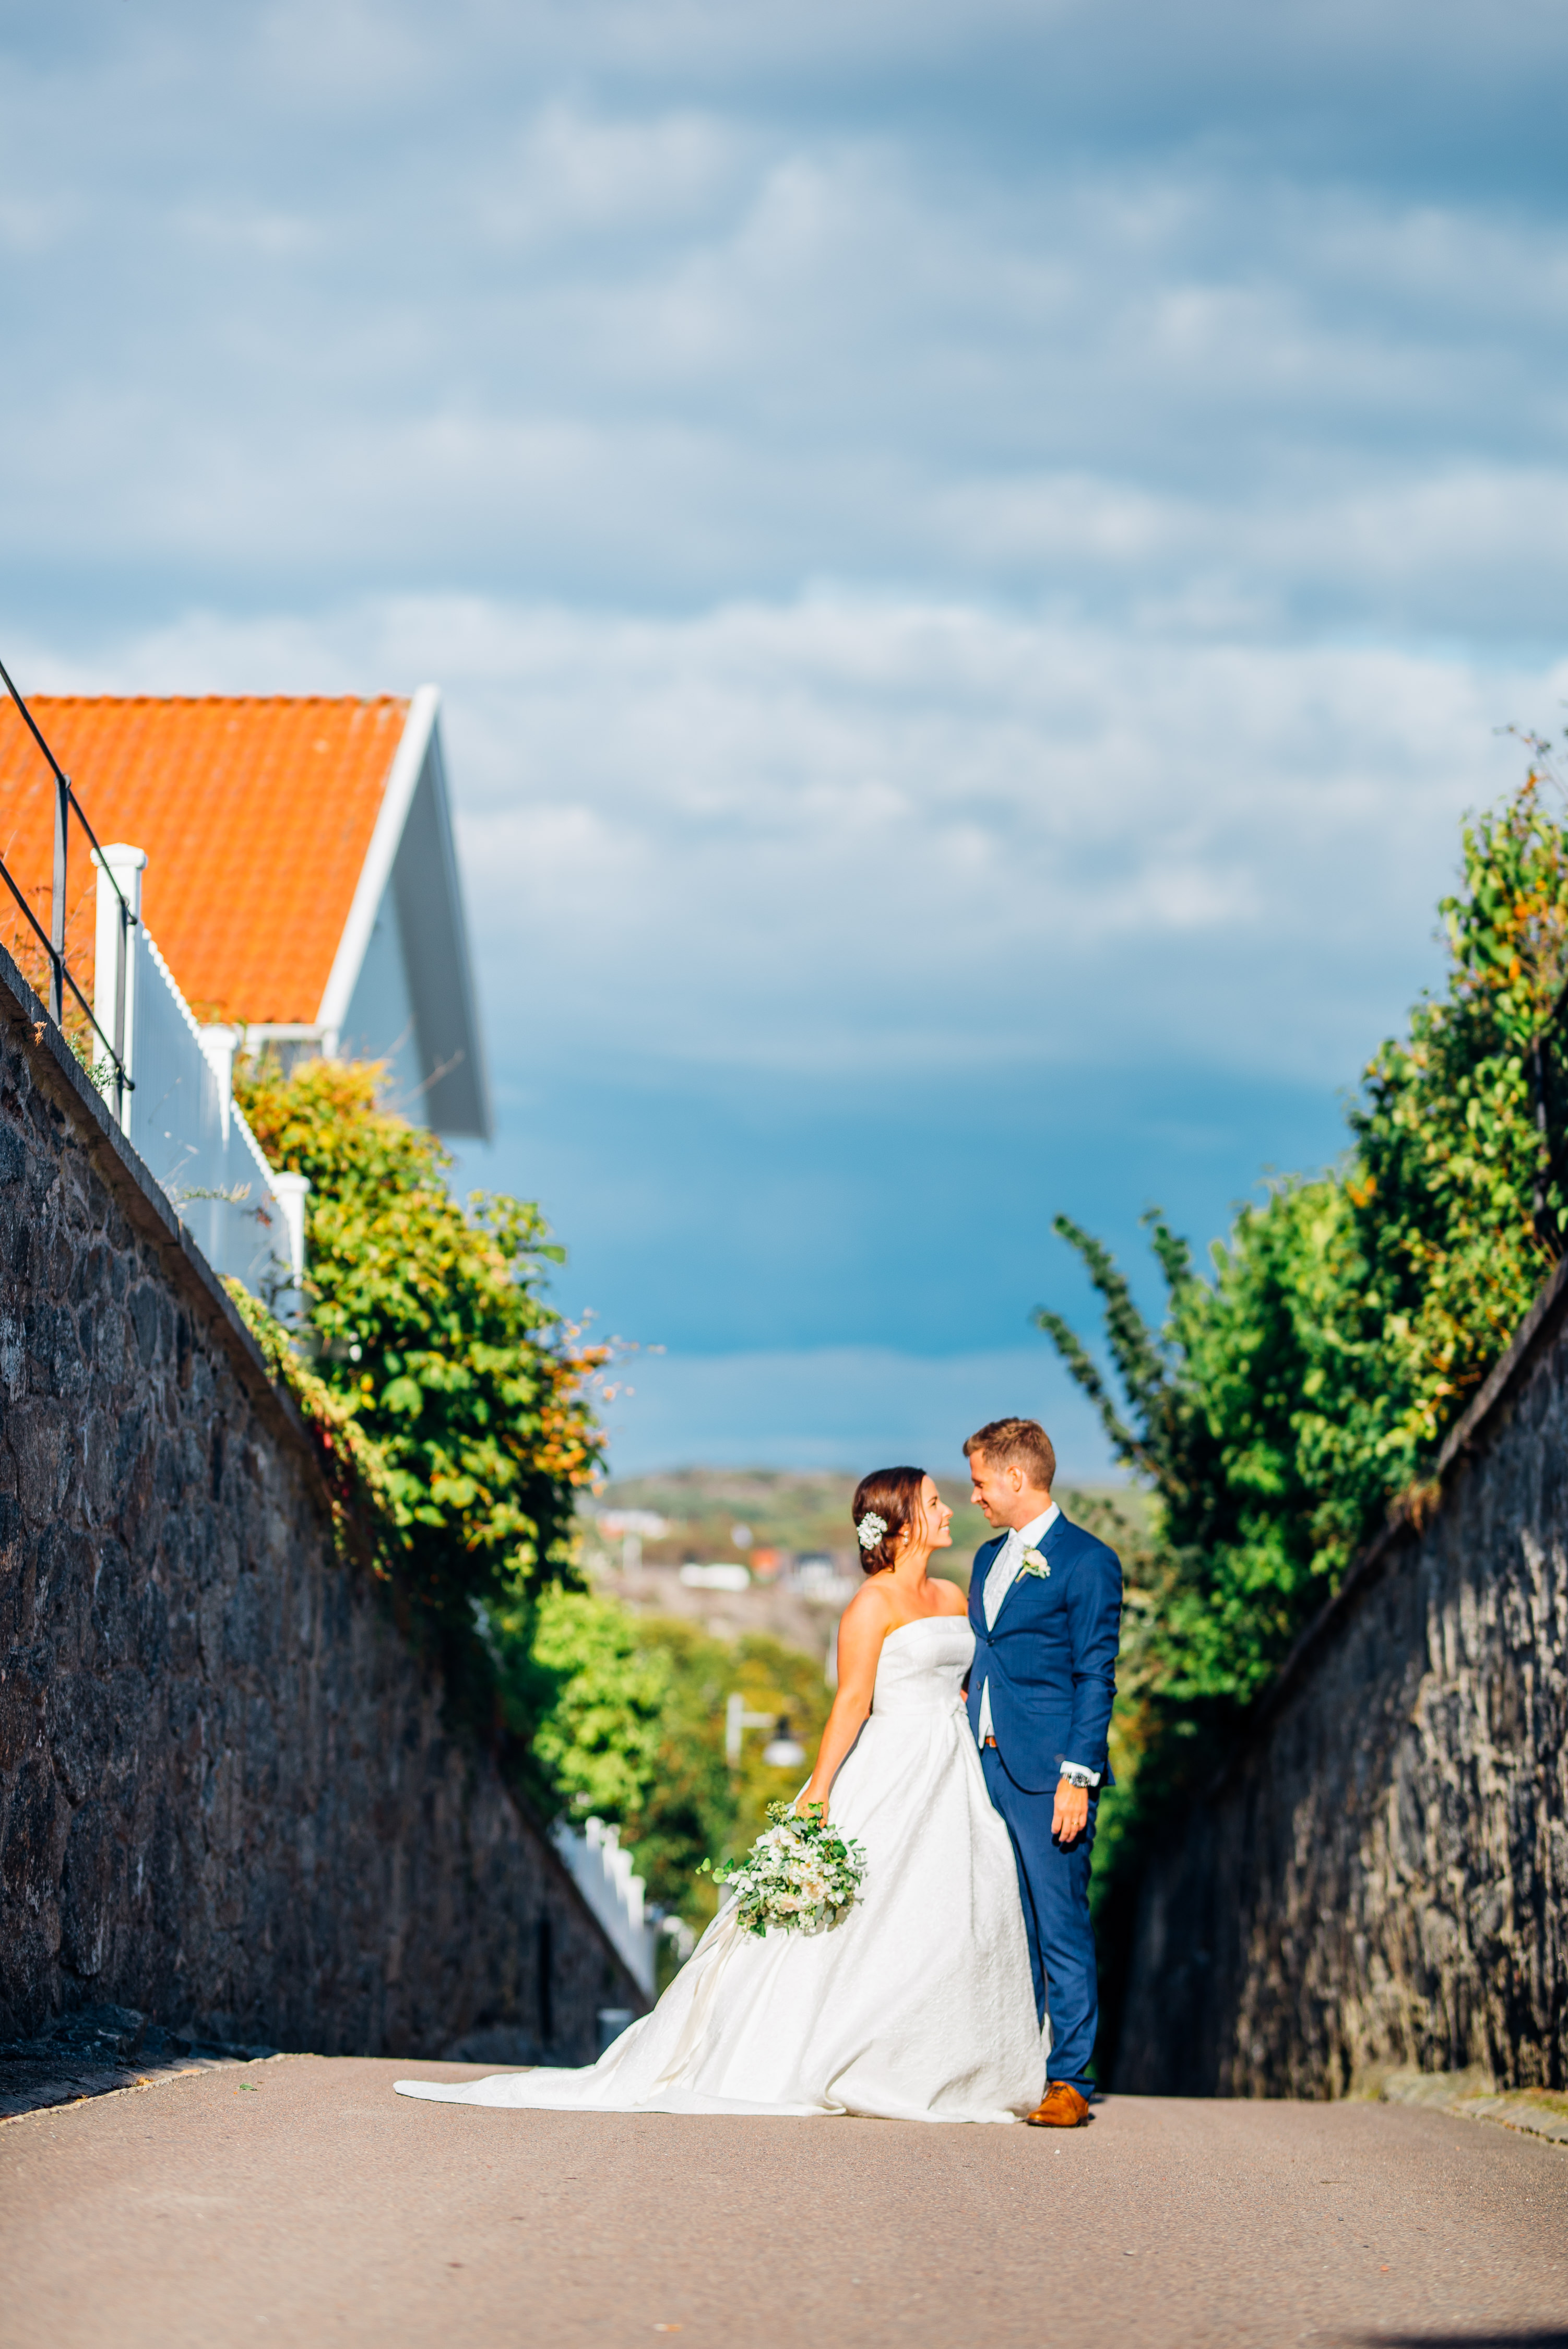 https://granslosabrollop.se/wp-content/uploads/2018/10/468-Christine-Hannes-Marstrand-Martina-Lundborg-Fotograf.jpg